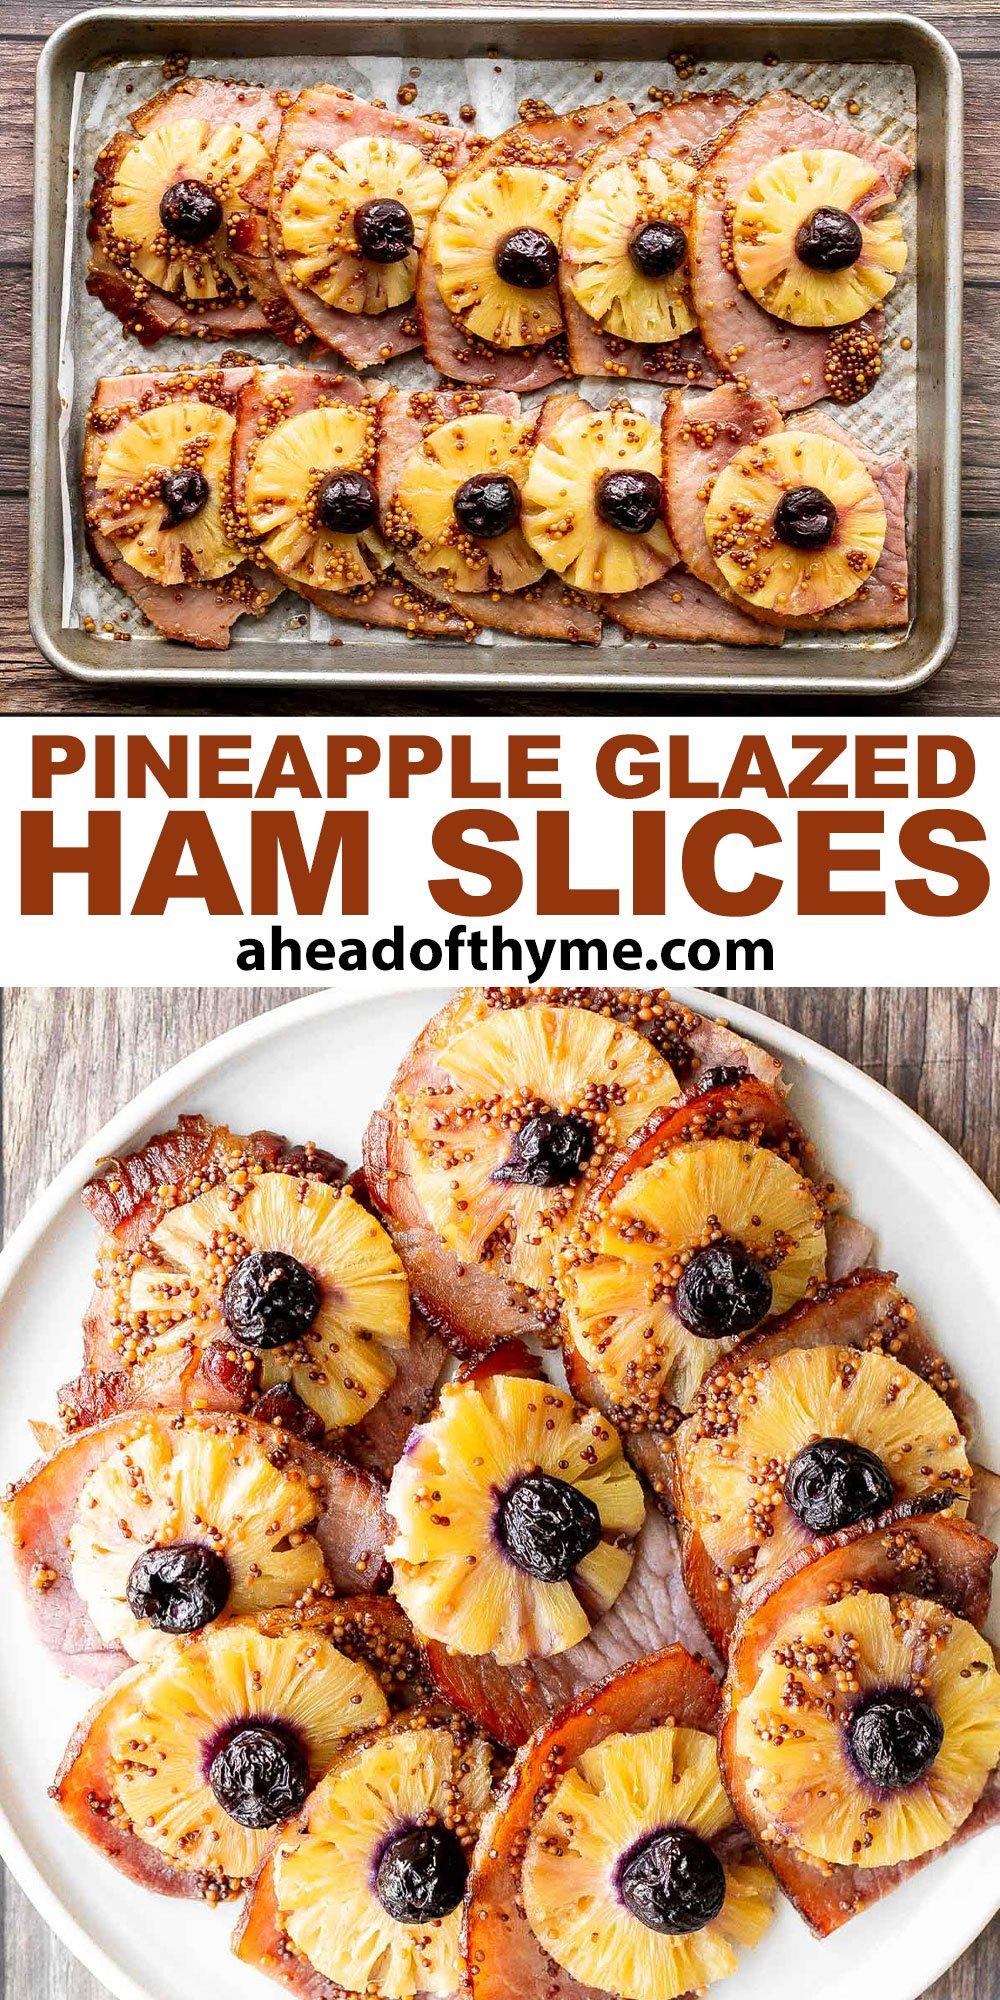 Pineapple Glazed Ham Slices